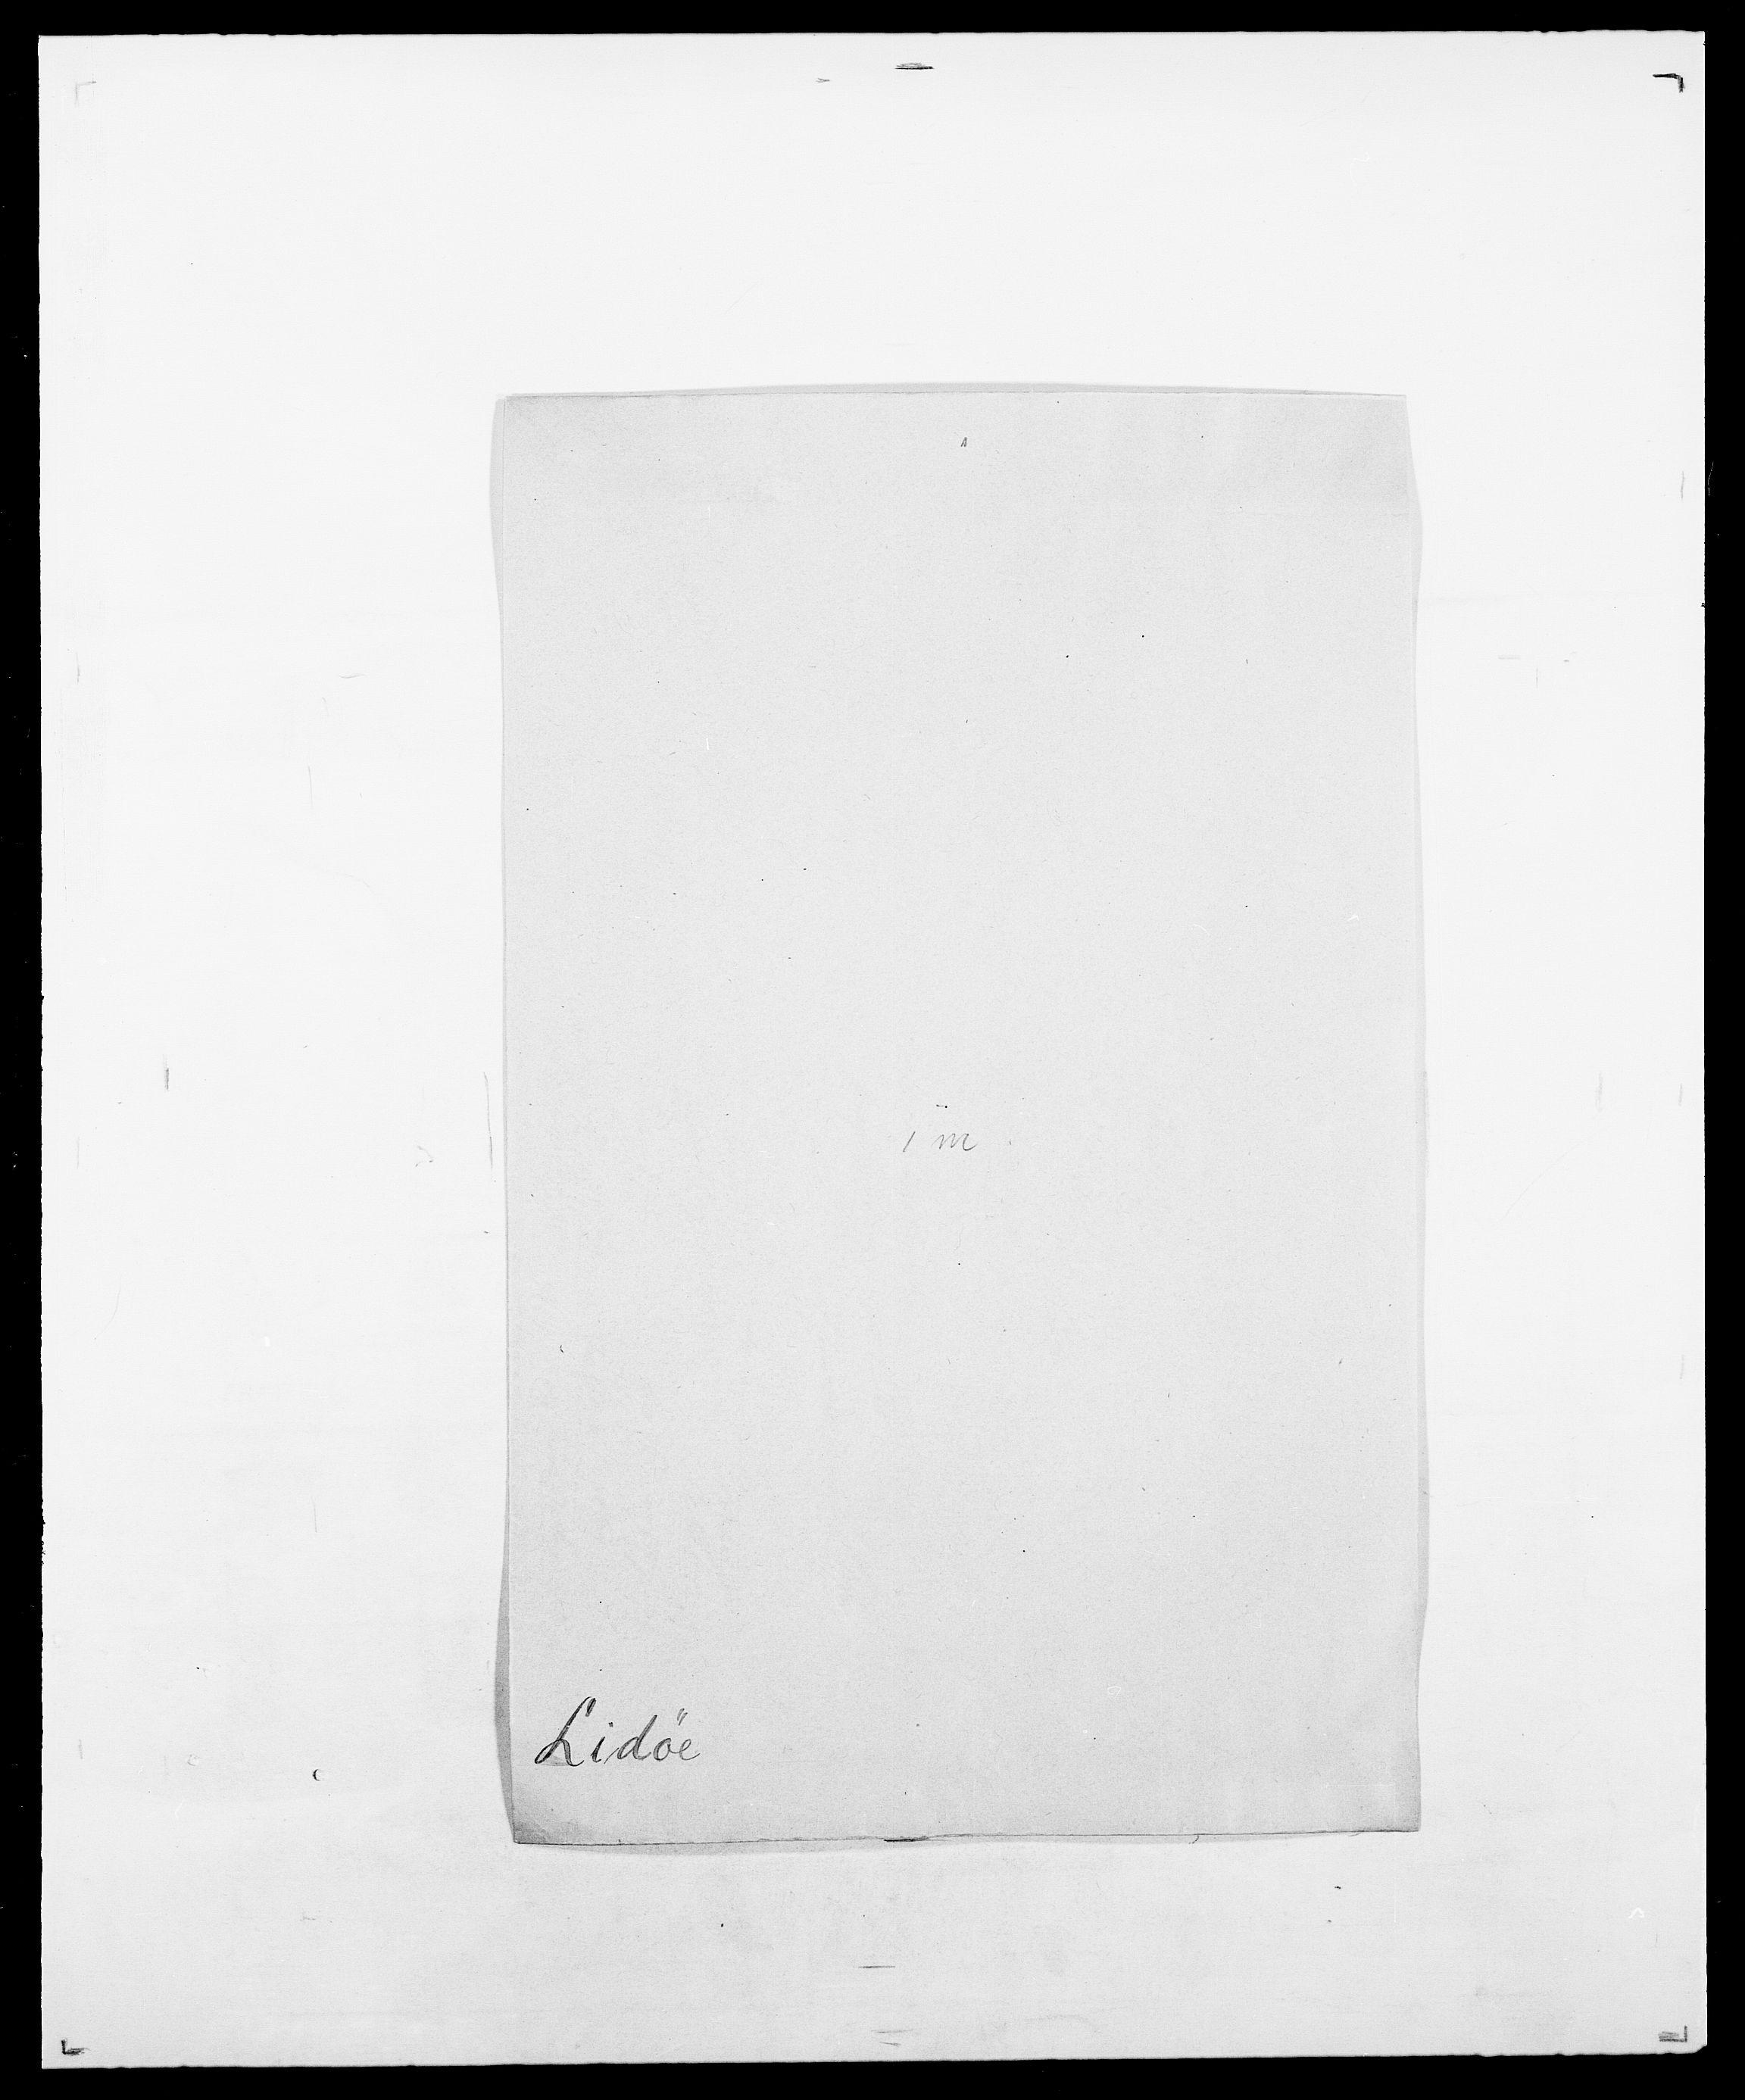 SAO, Delgobe, Charles Antoine - samling, D/Da/L0023: Lau - Lirvyn, s. 327